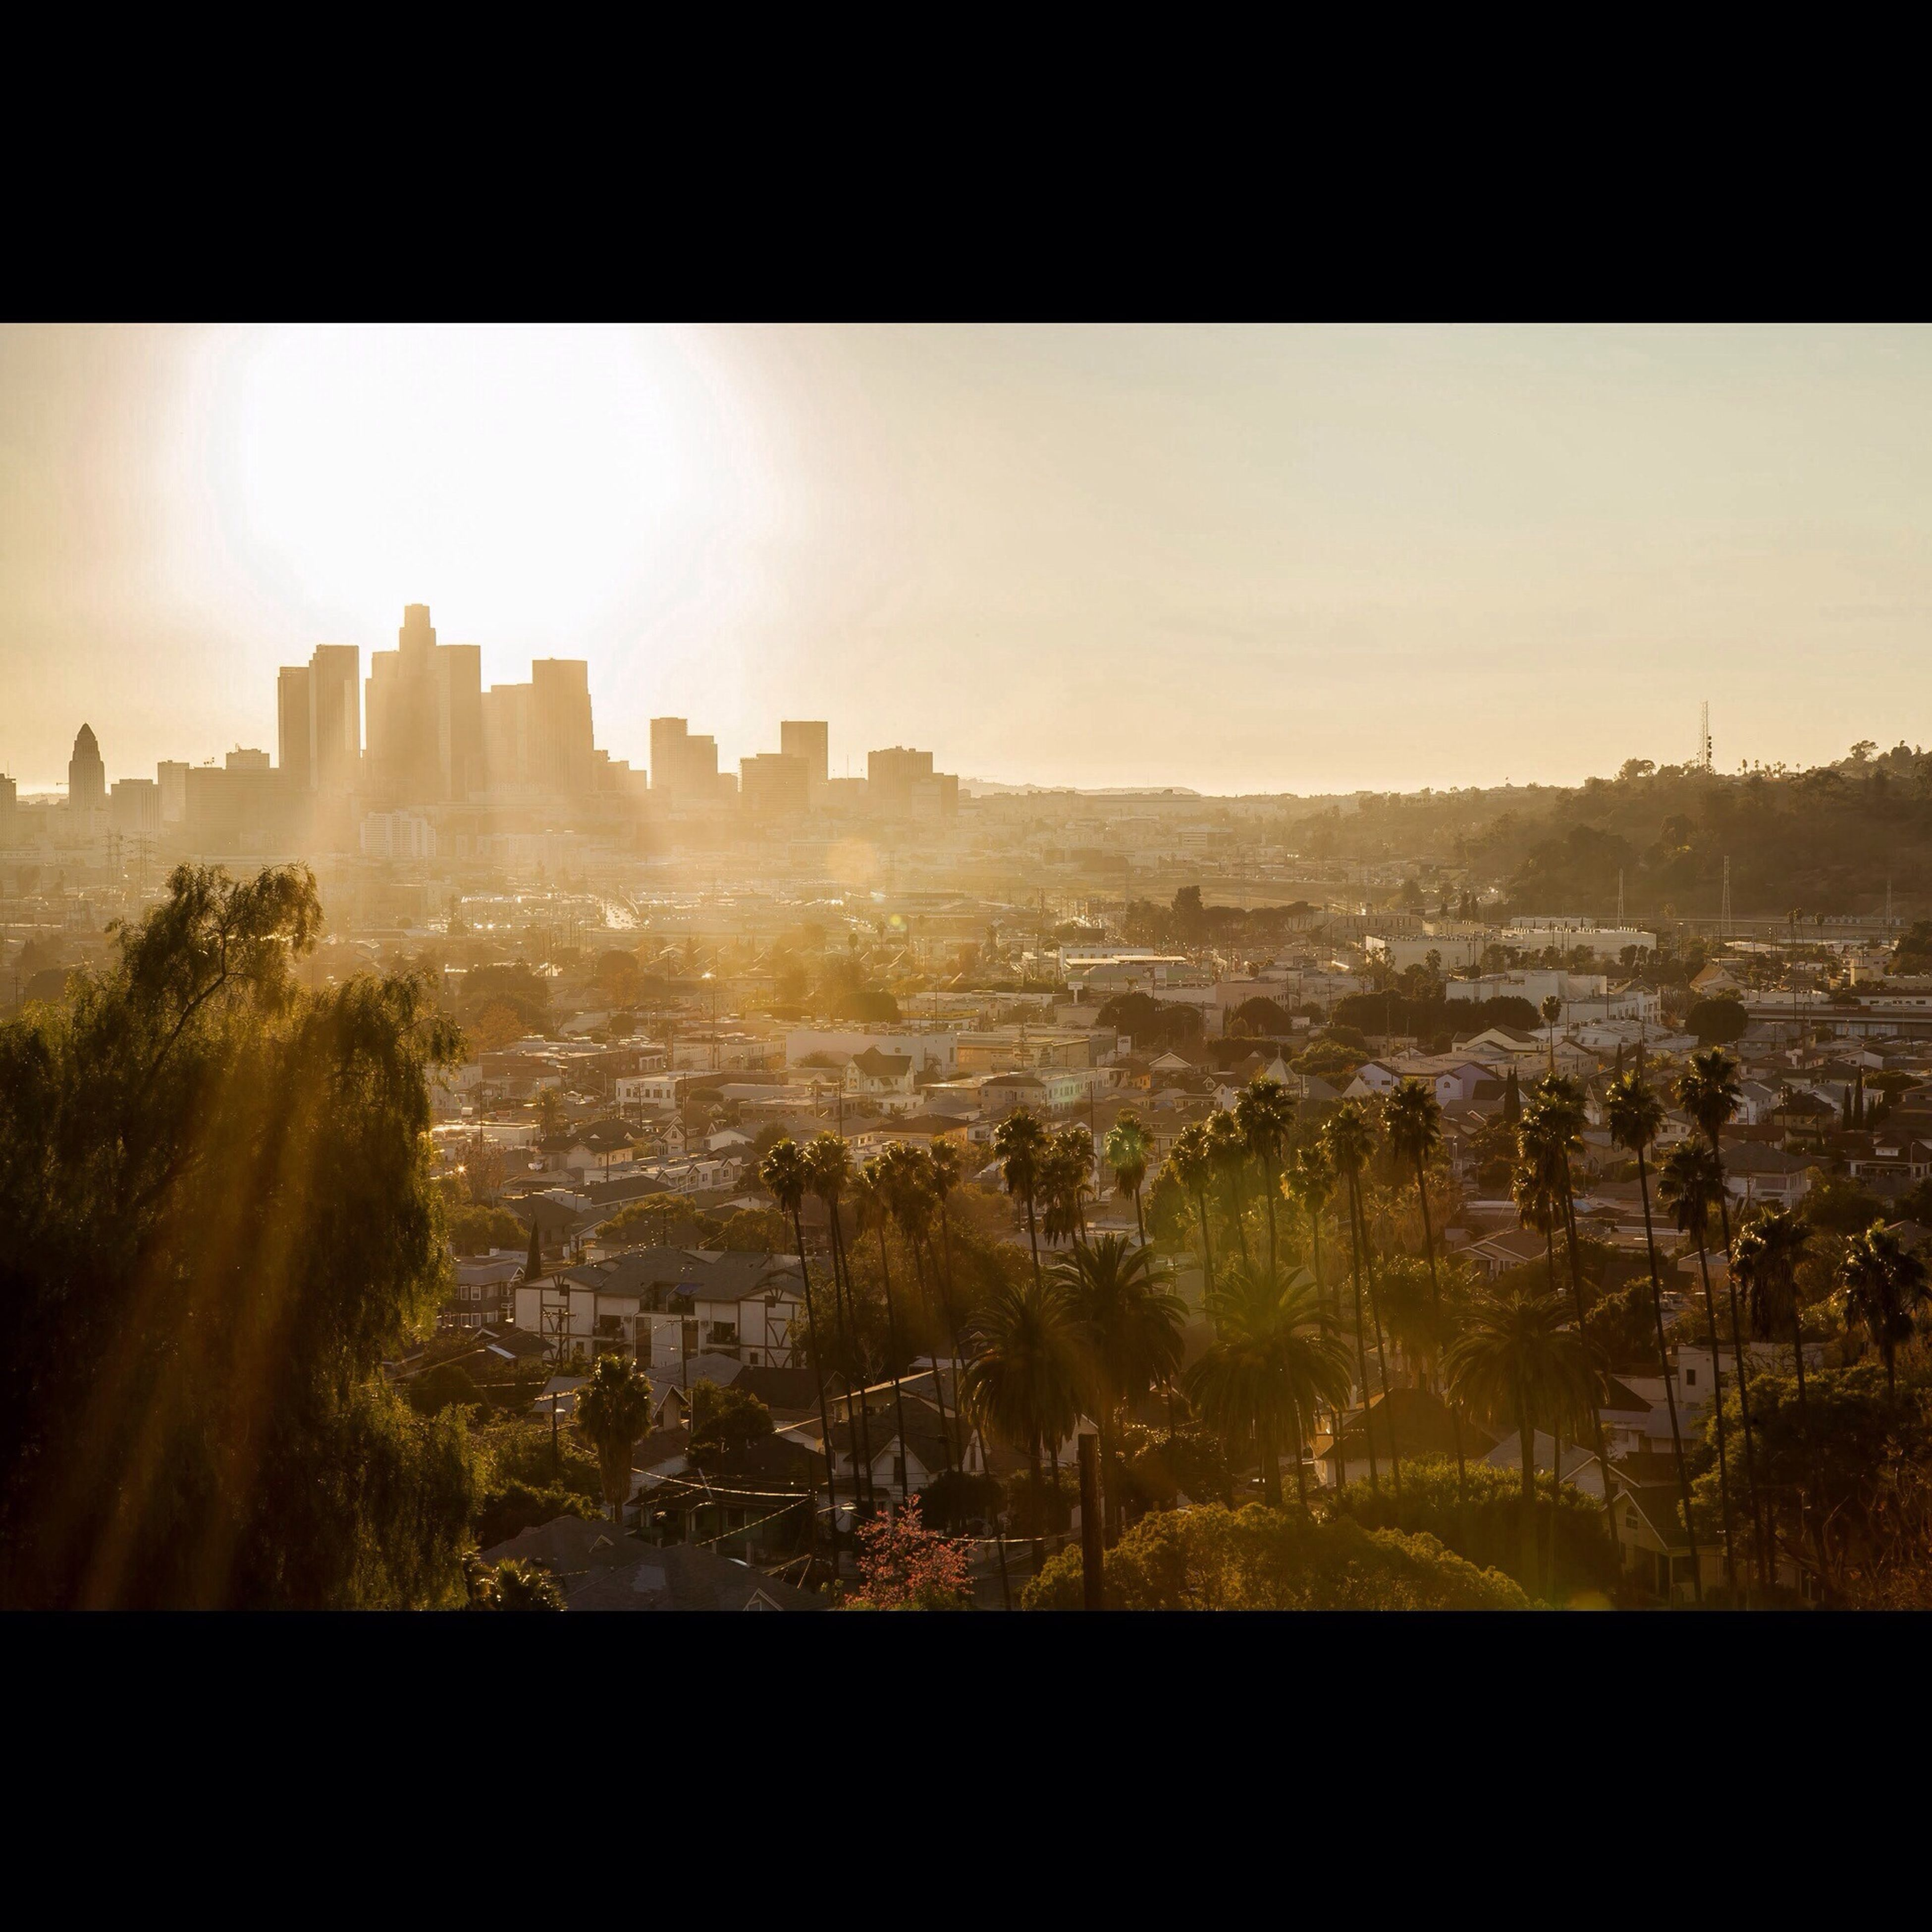 Angel's Halo DTLA Skyline Habitual Trespasser Los Angeles, California